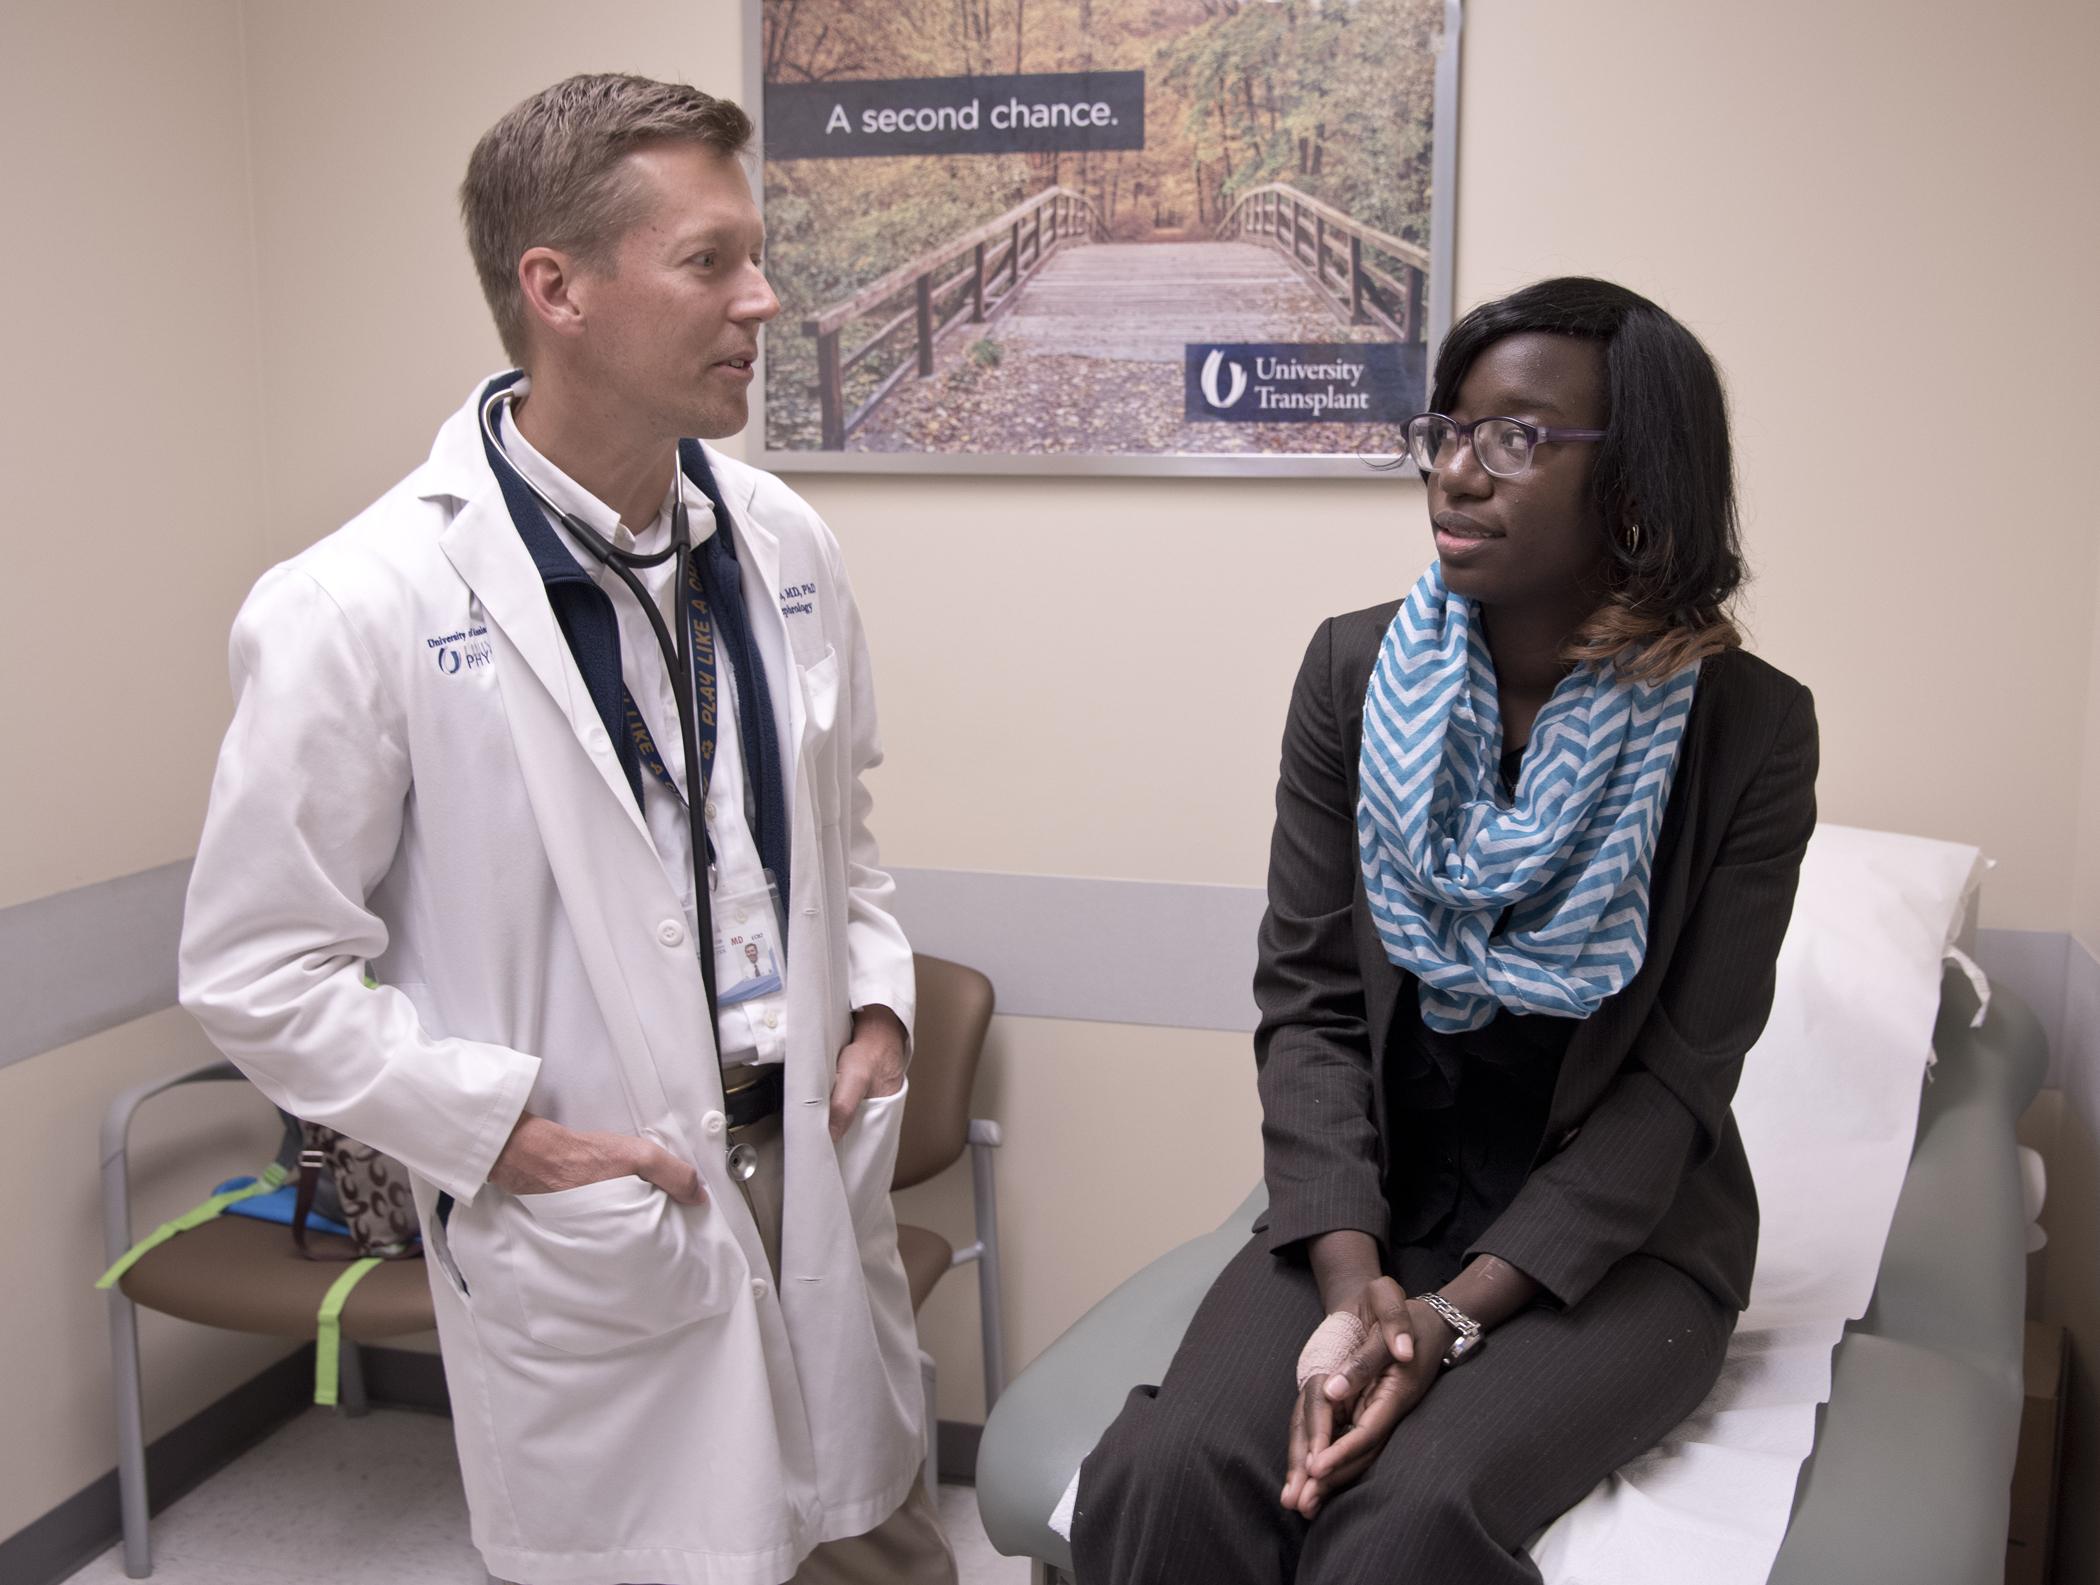 Grenada, Biloxi transplant clinics enhance access to care